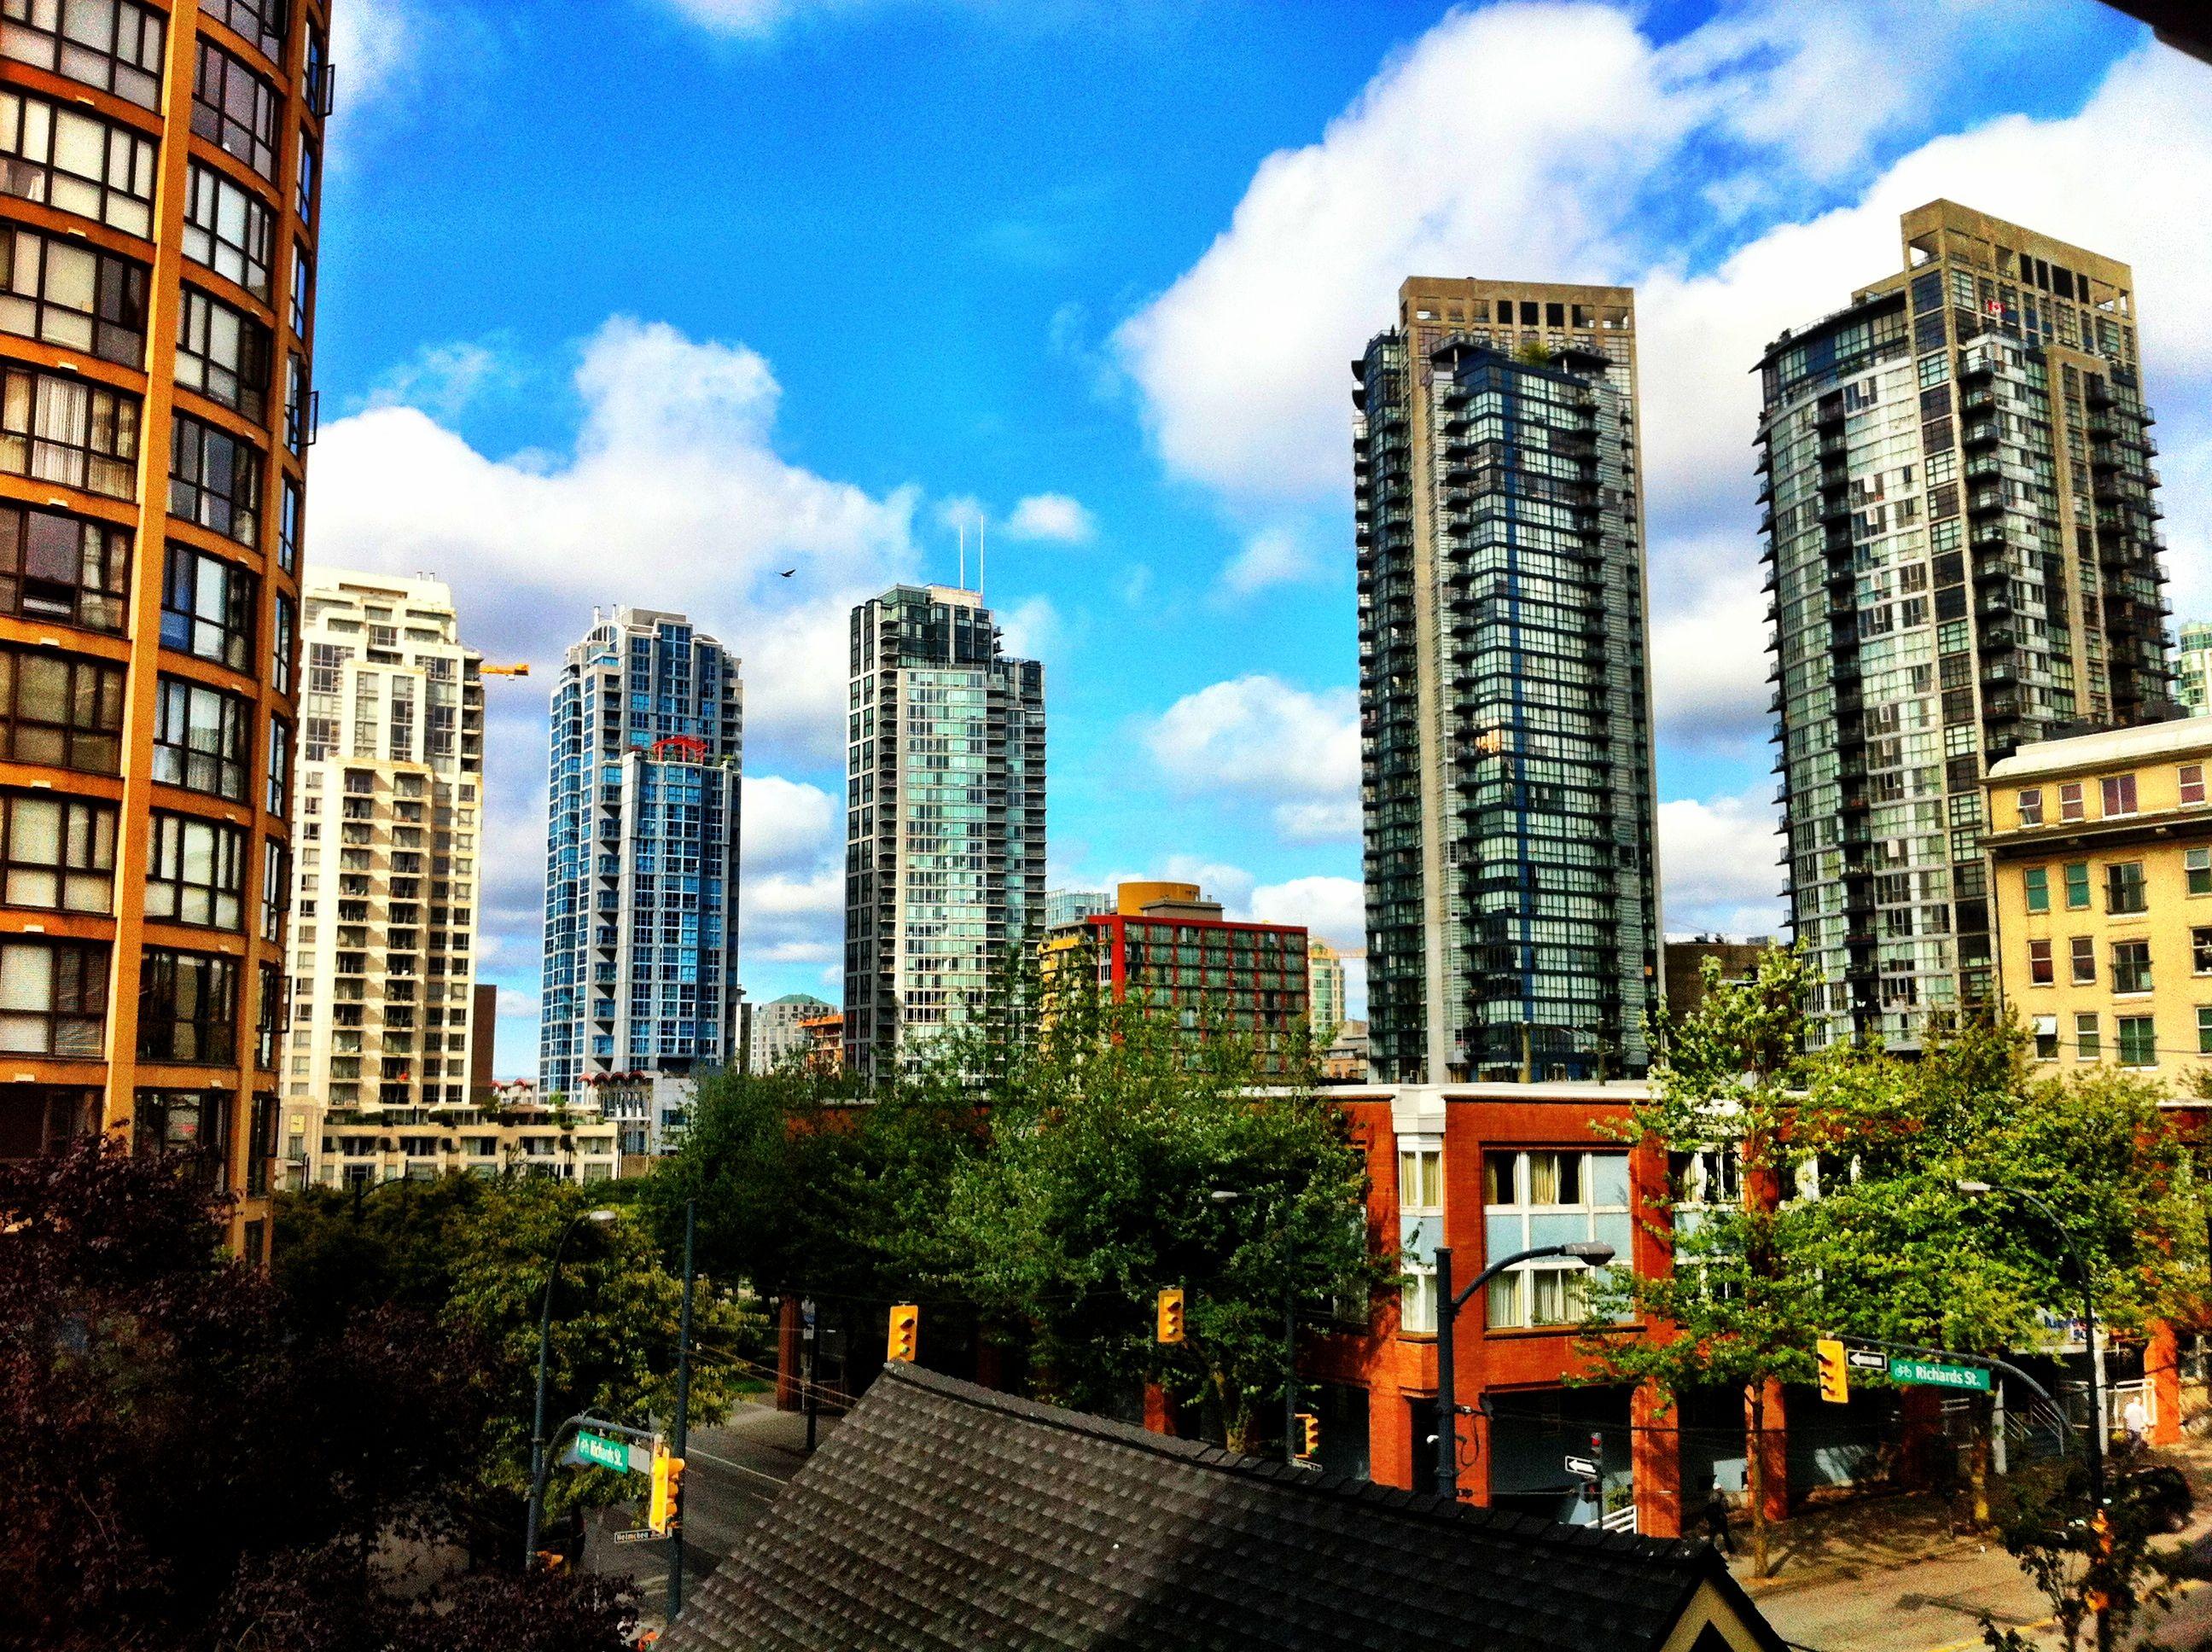 The Van | Apartment guide, Vancouver apartment, Rental ...